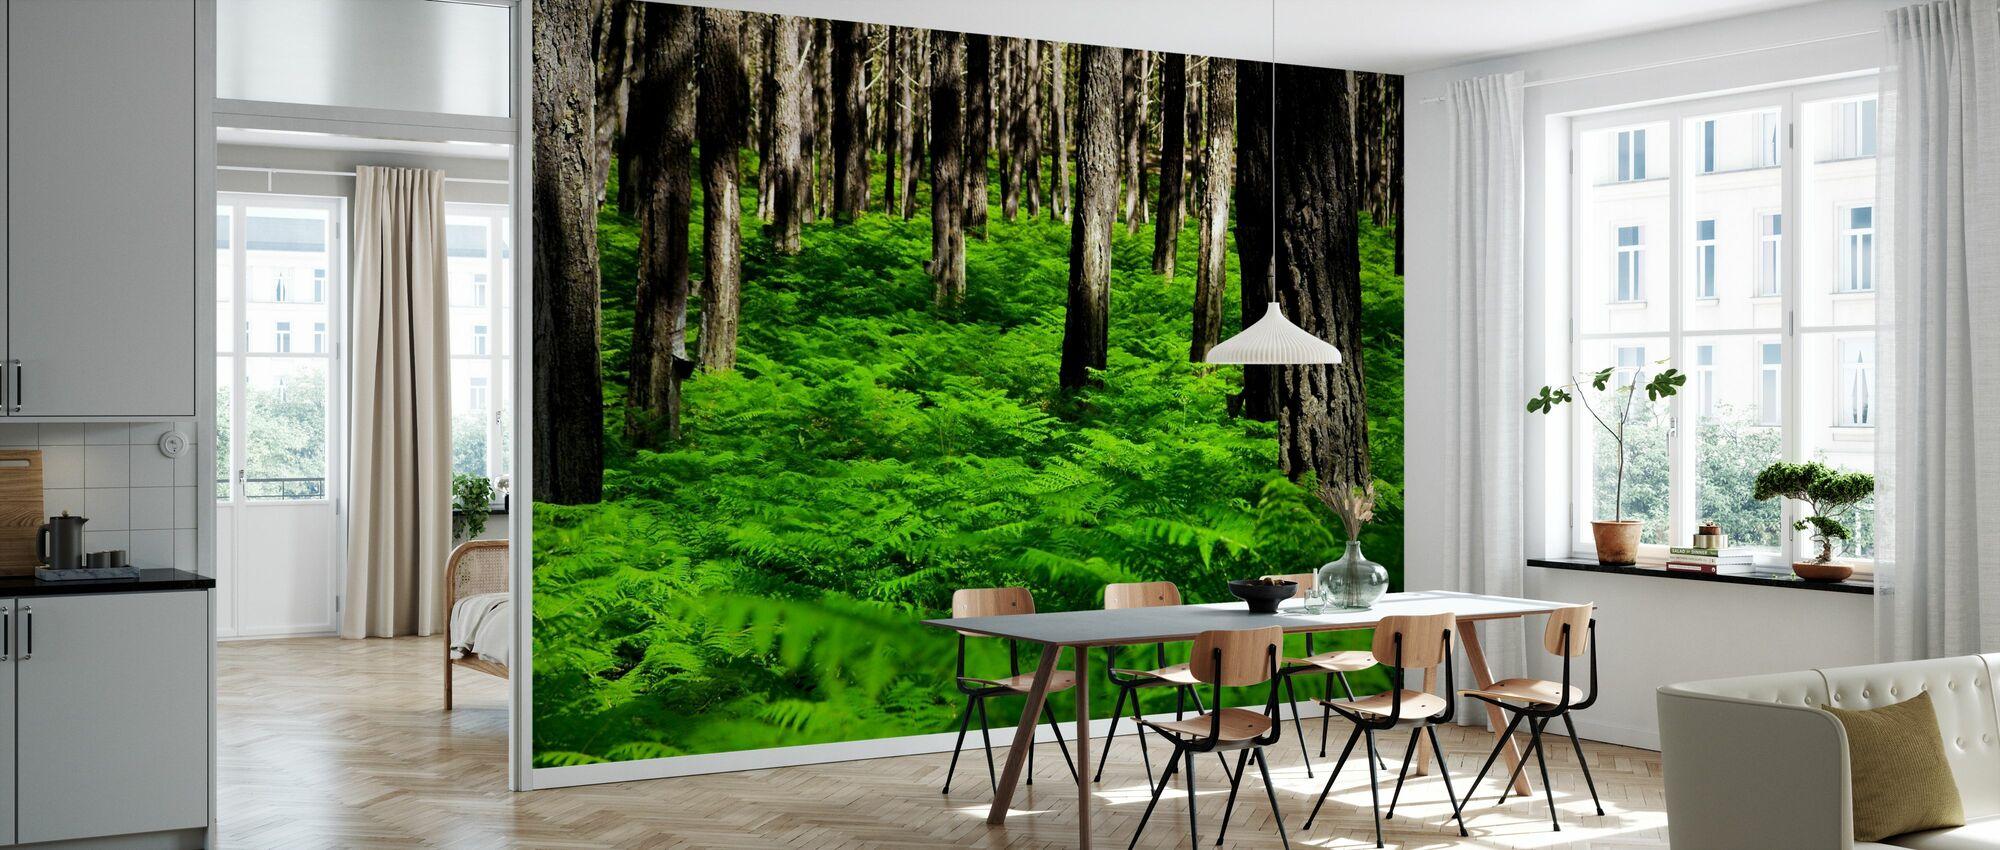 Groene Harmonie - Behang - Keuken